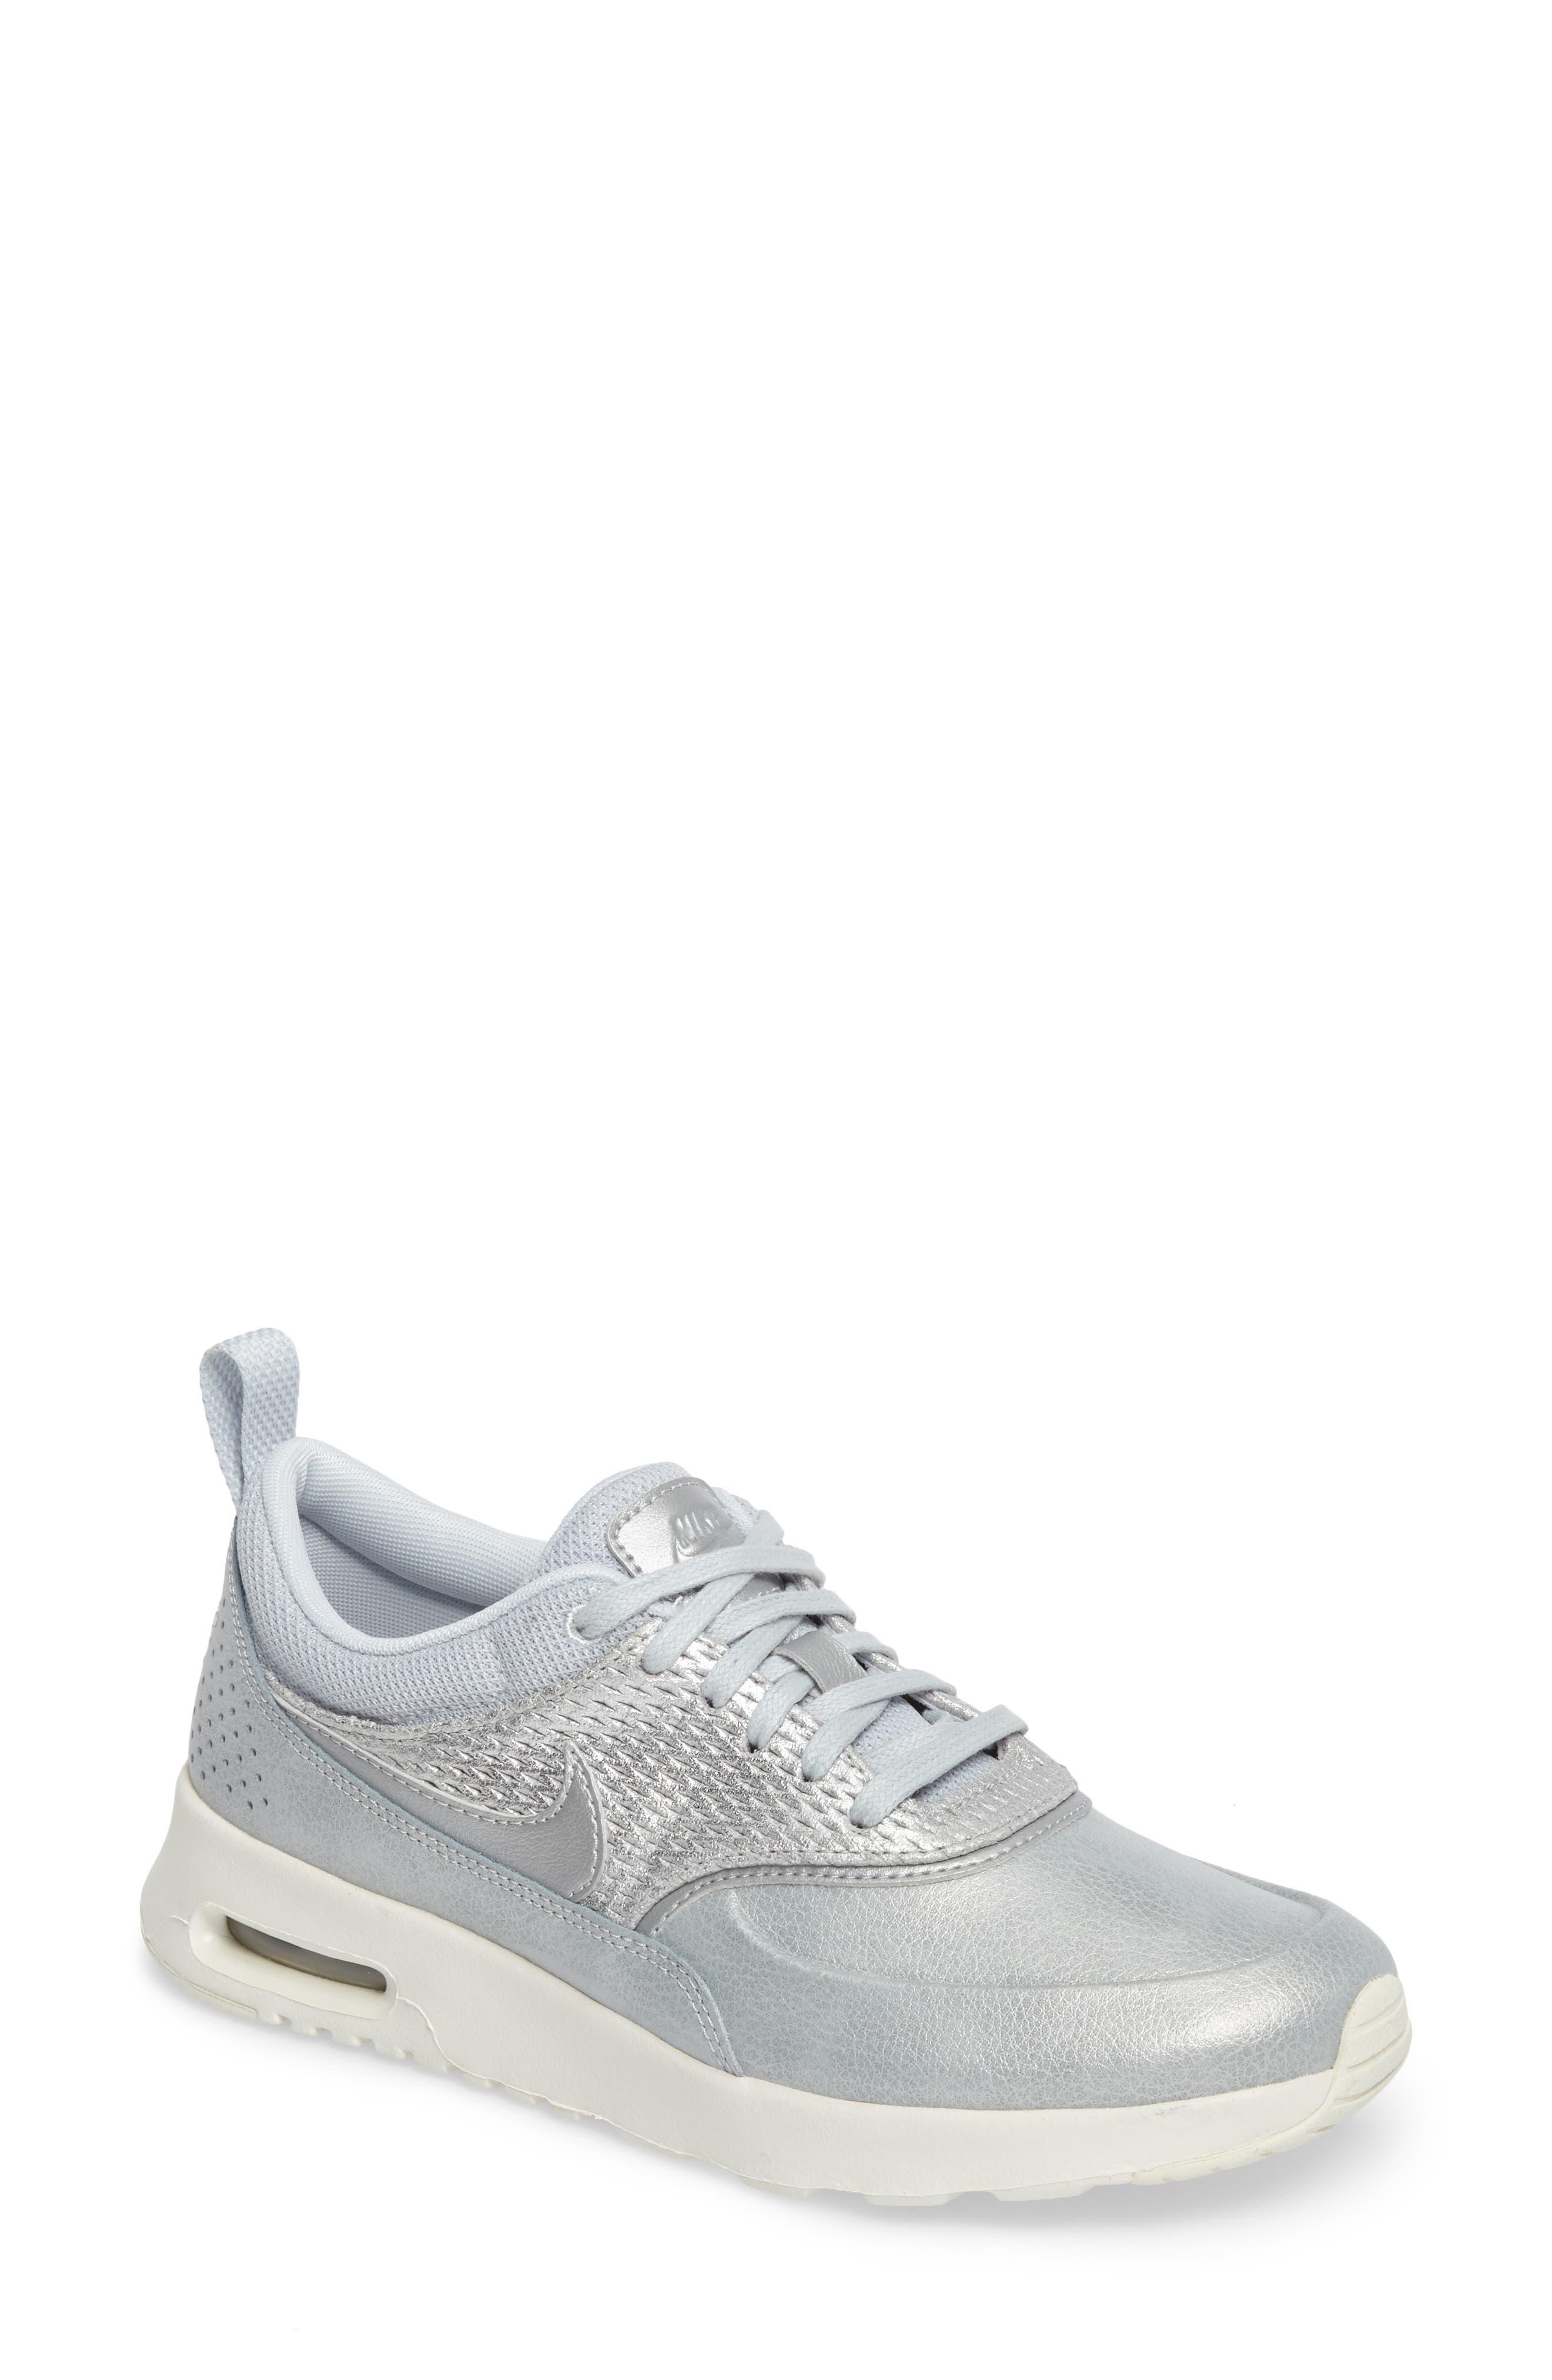 Air Max Thea Premium Sneaker,                             Main thumbnail 2, color,